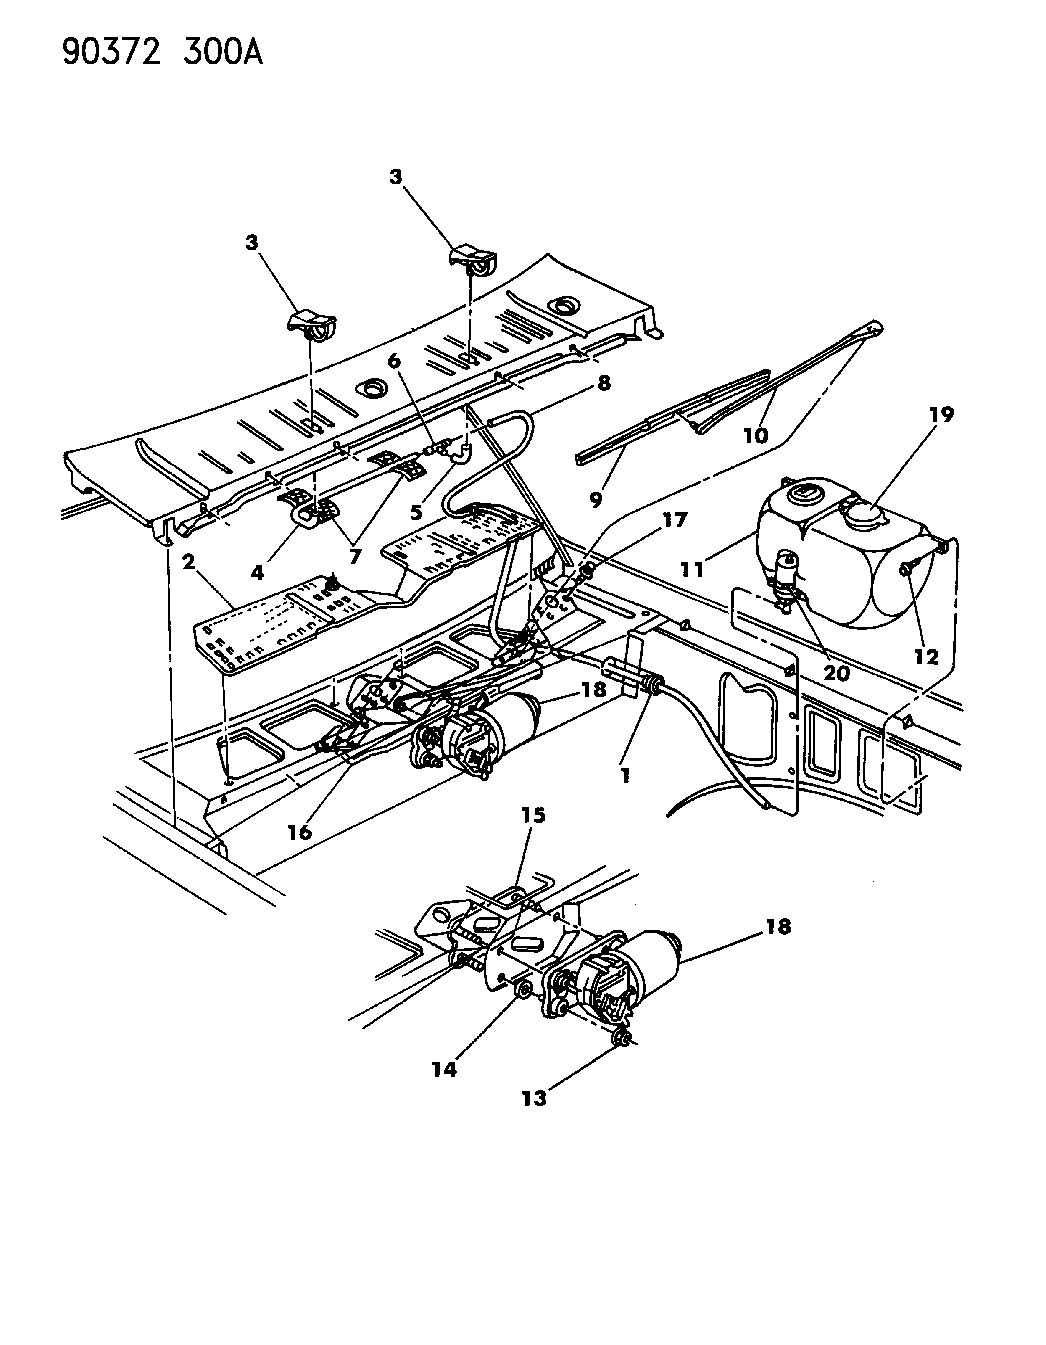 1992 Dodge Dakota Windshield Wiper & Washer System